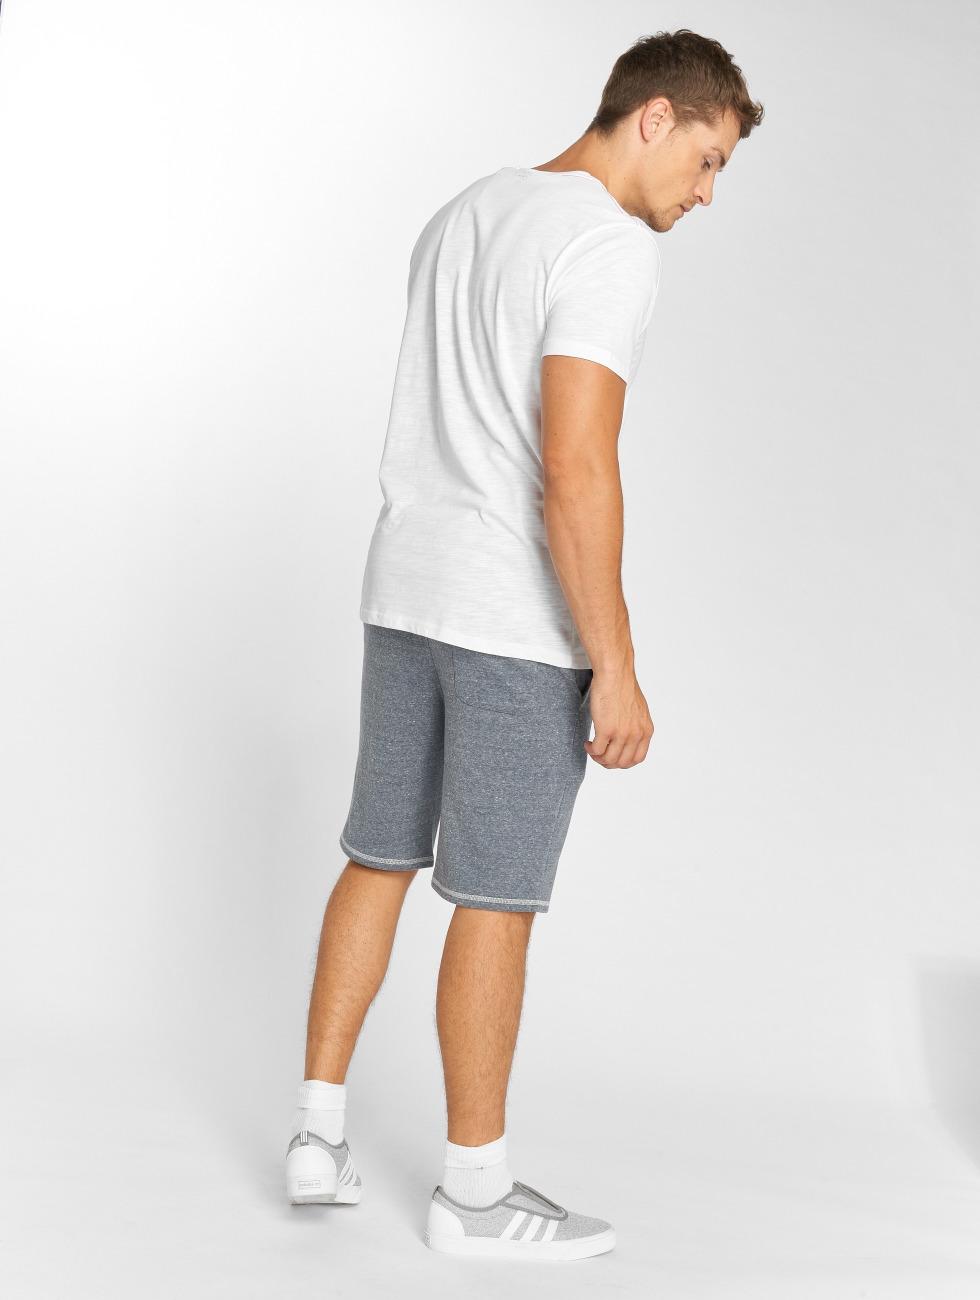 Solid Camiseta Odissan blanco